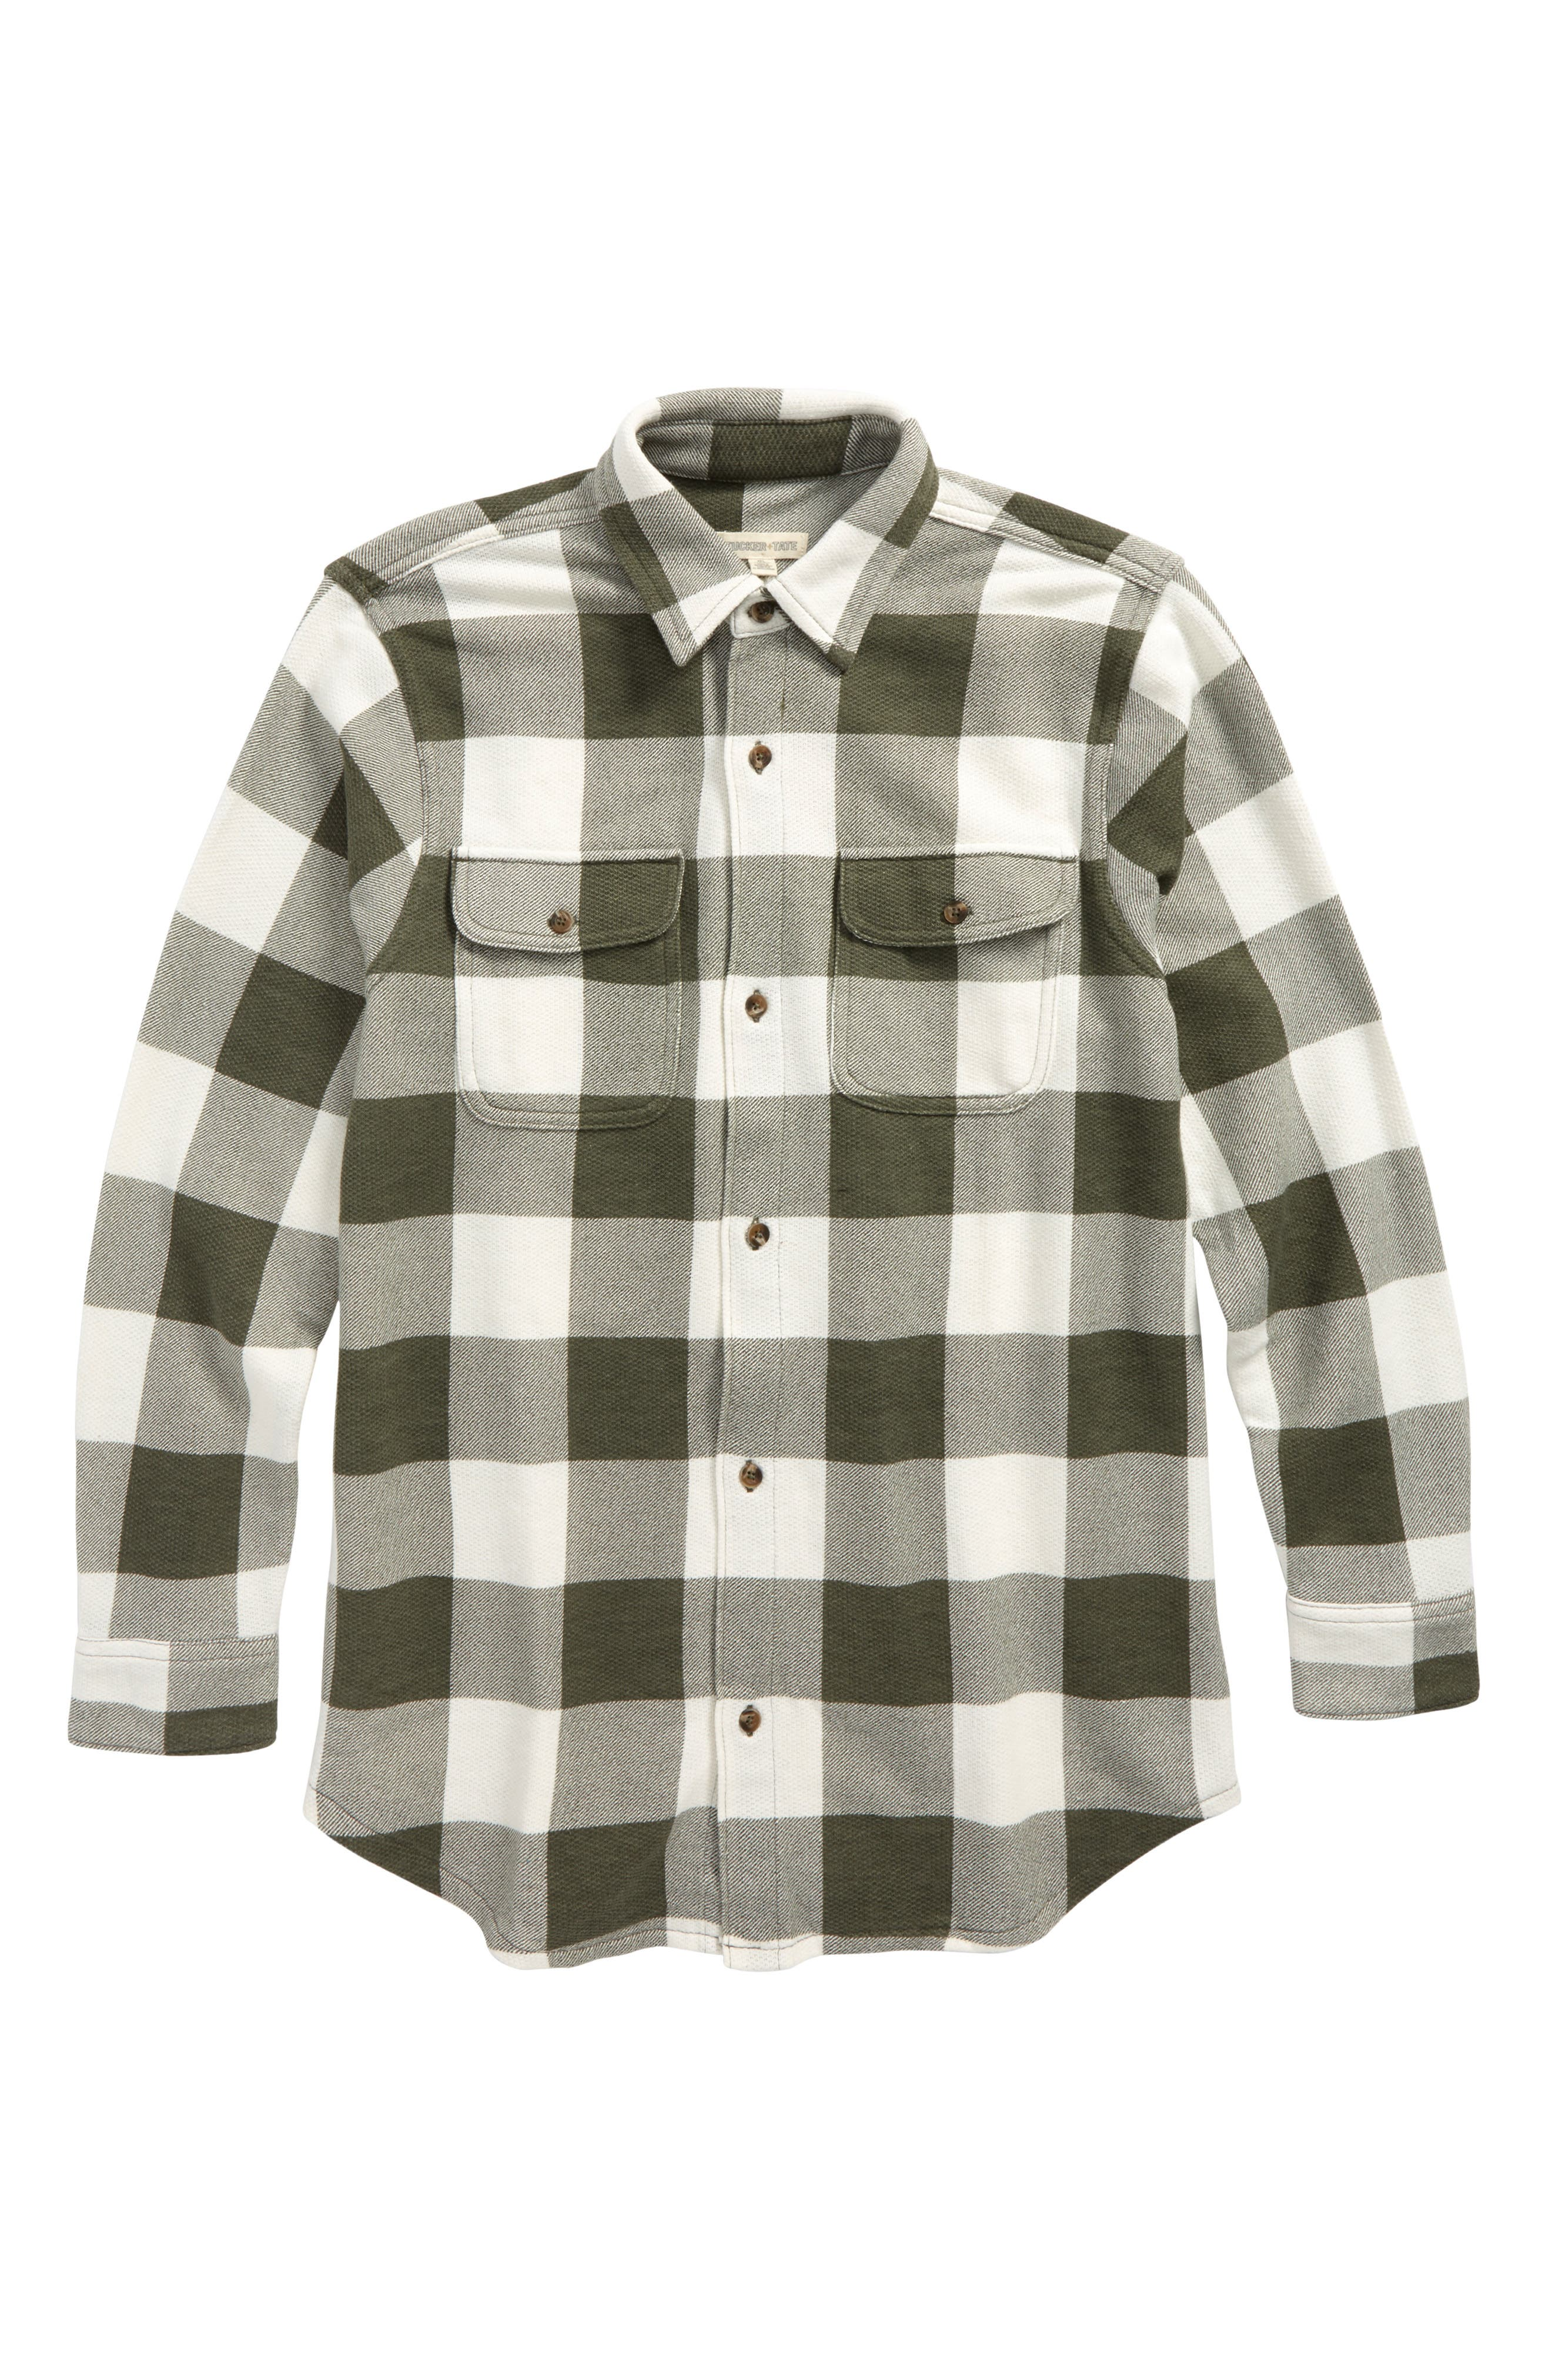 Woven Plaid Shirt,                             Main thumbnail 1, color,                             Olive Sarma- Ivory Check